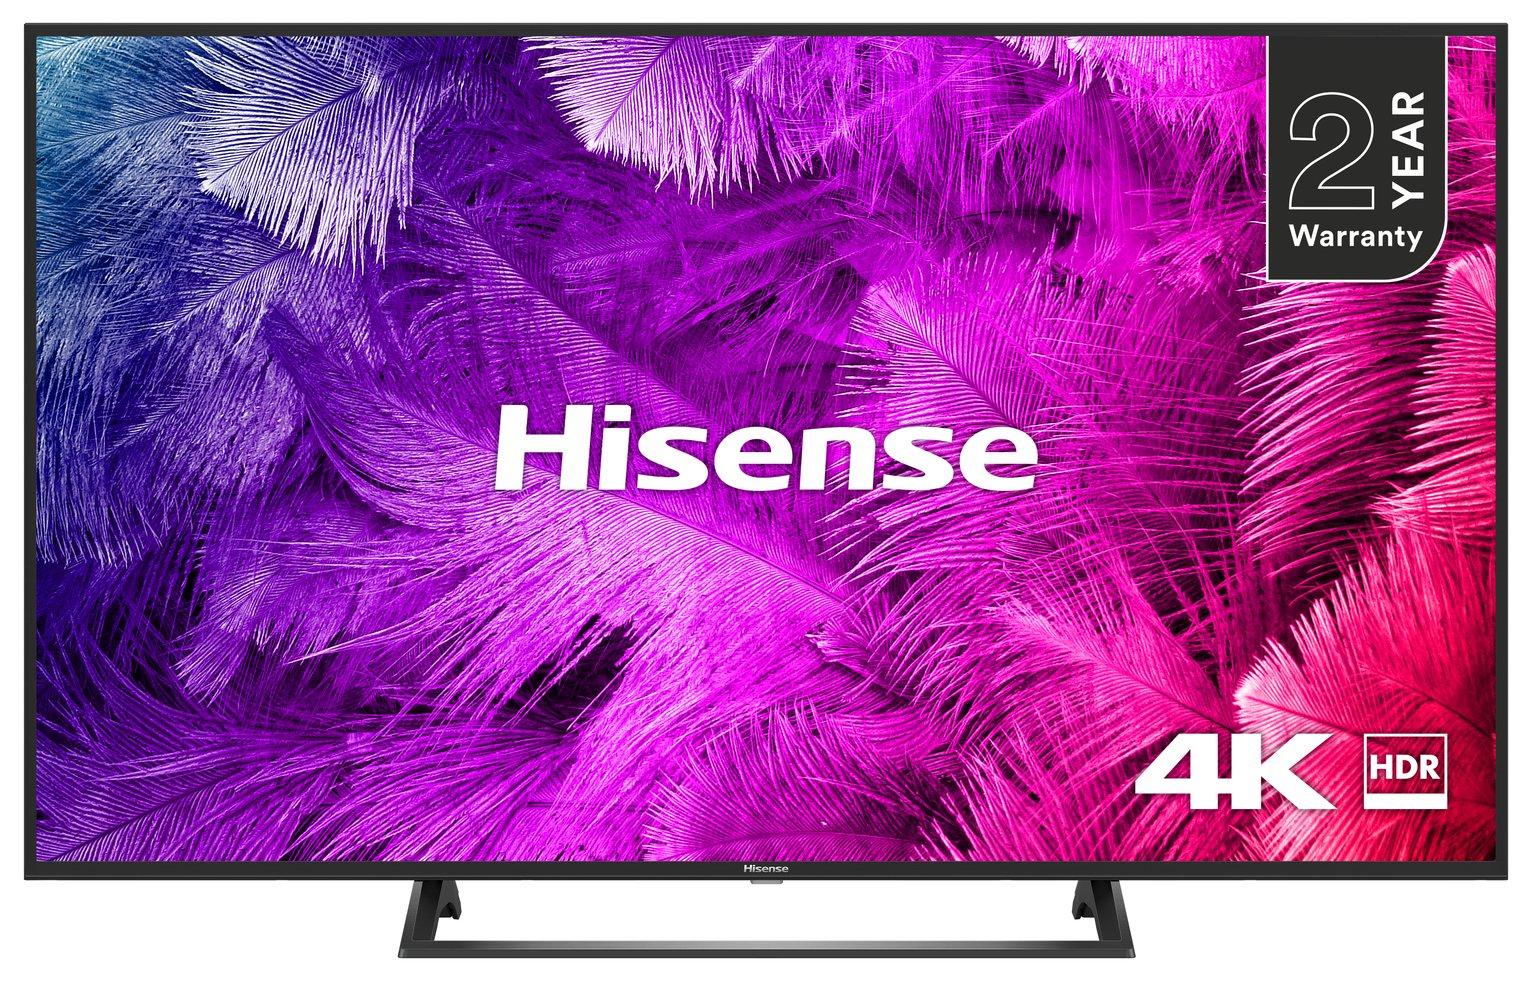 Hisense 50 Inch H50B7300UK Smart 4K HDR LED TV 2019 + 2 year warranty £349 @ Argos